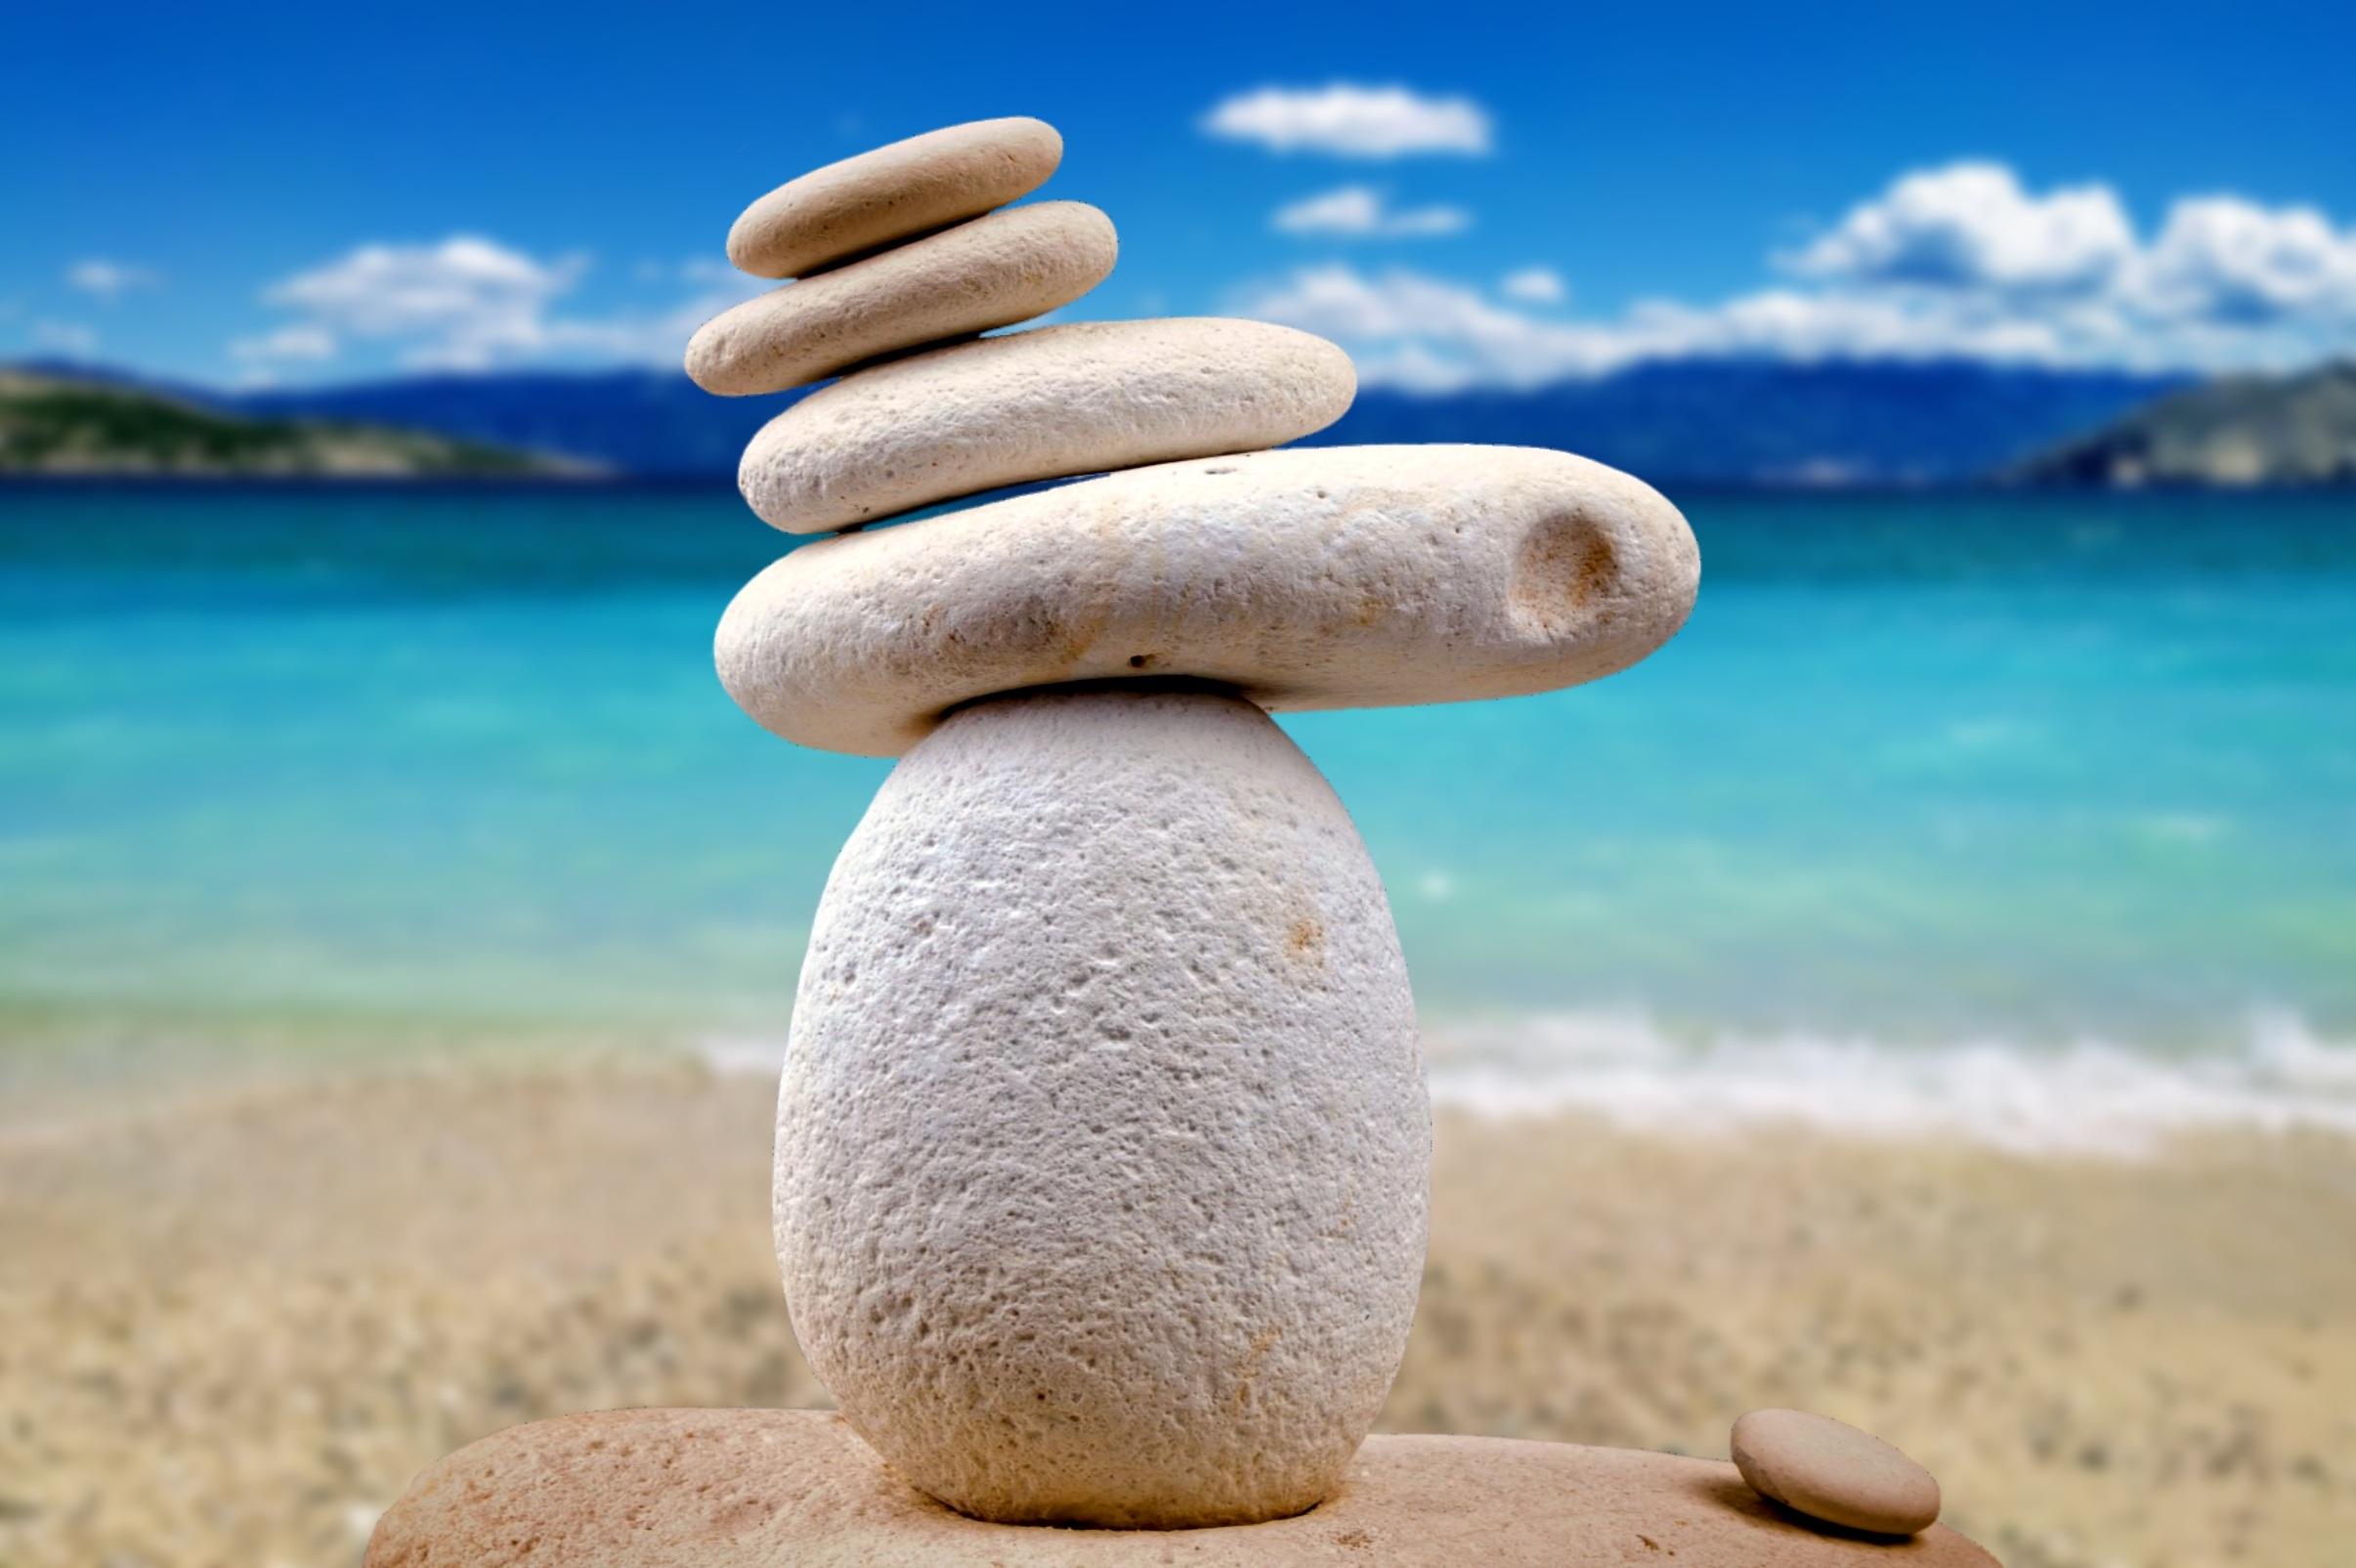 Balancing Zen Stones Fond d'écran HD | Arrière-Plan | 2411x1605 | ID:873417 - Wallpaper Abyss